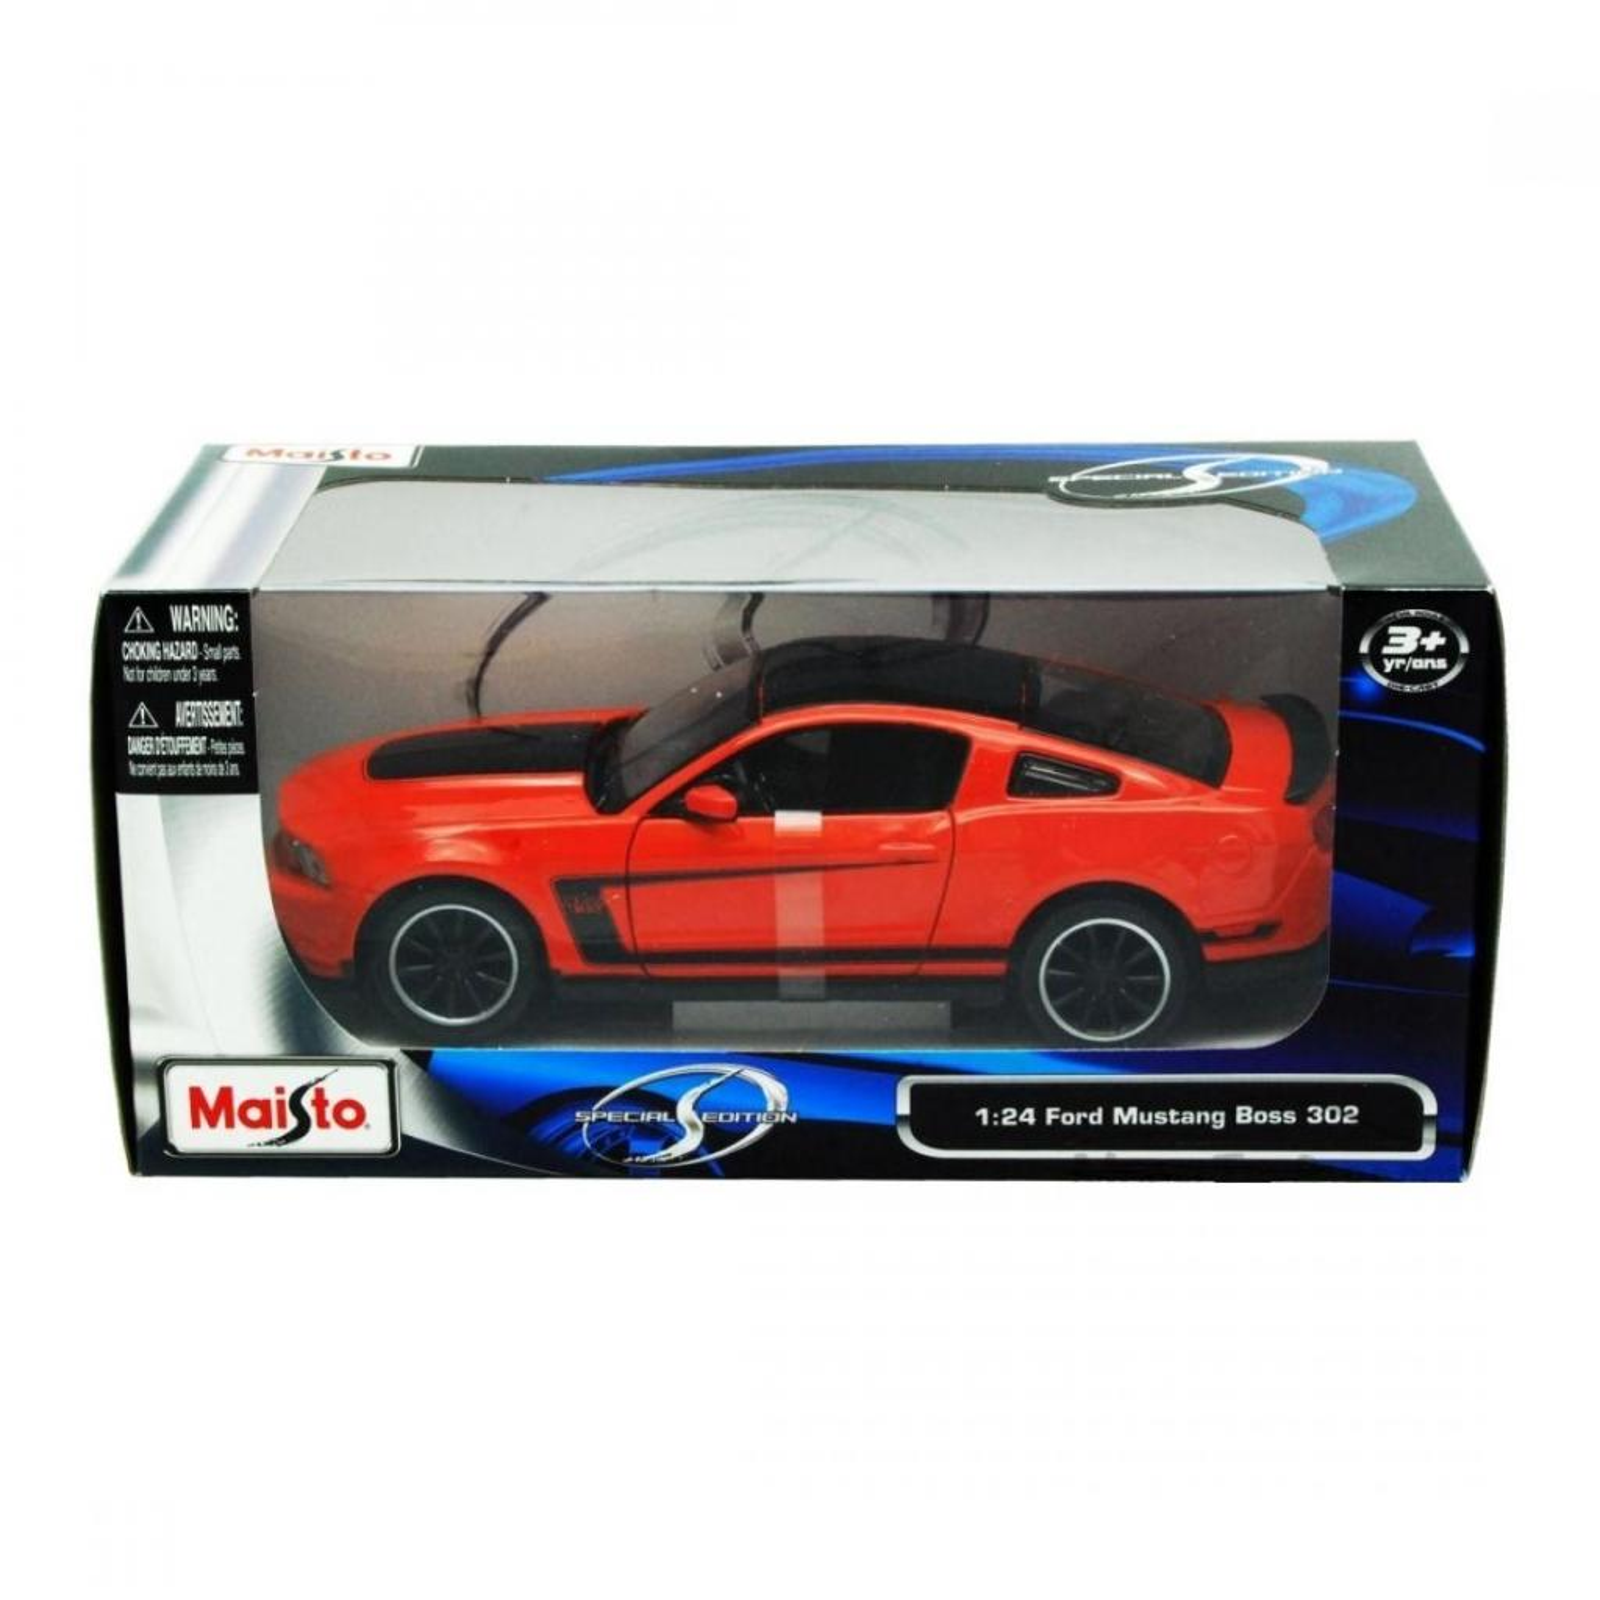 Машина Maisto Ford Mustang Boss 302 (1:24) оражевый (31269 orange) изображение 6